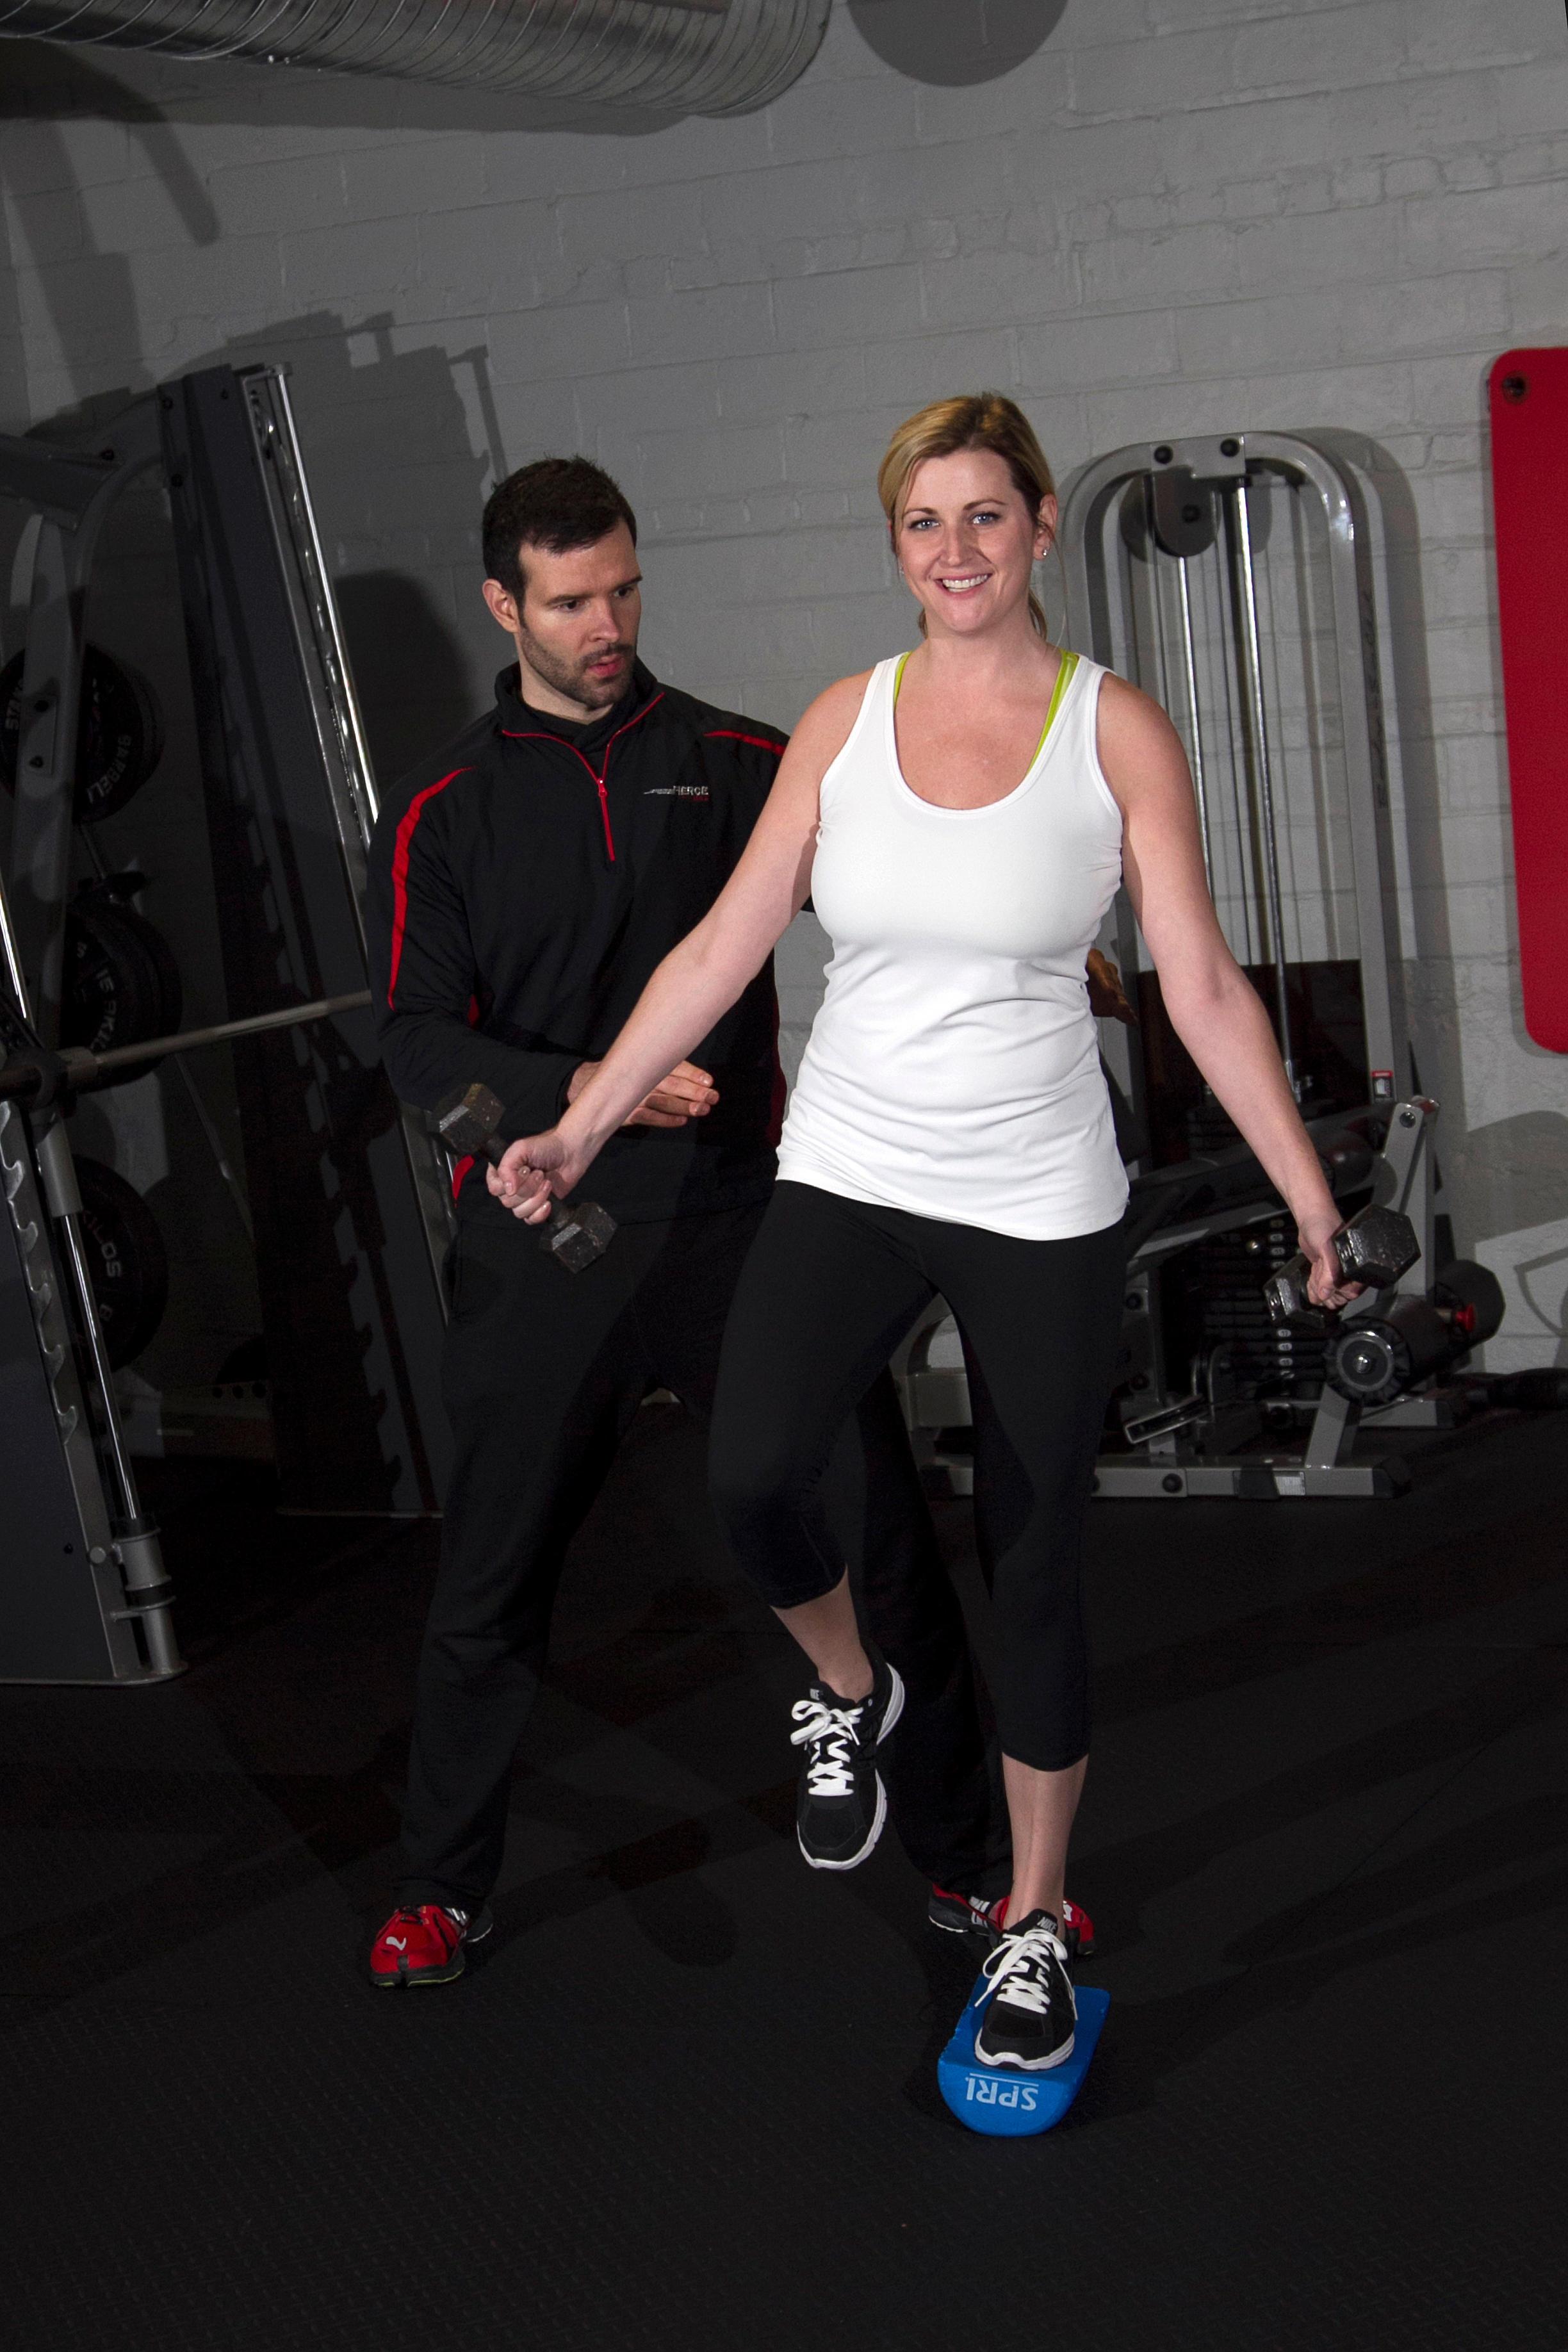 Fierce Fitness LLC image 7